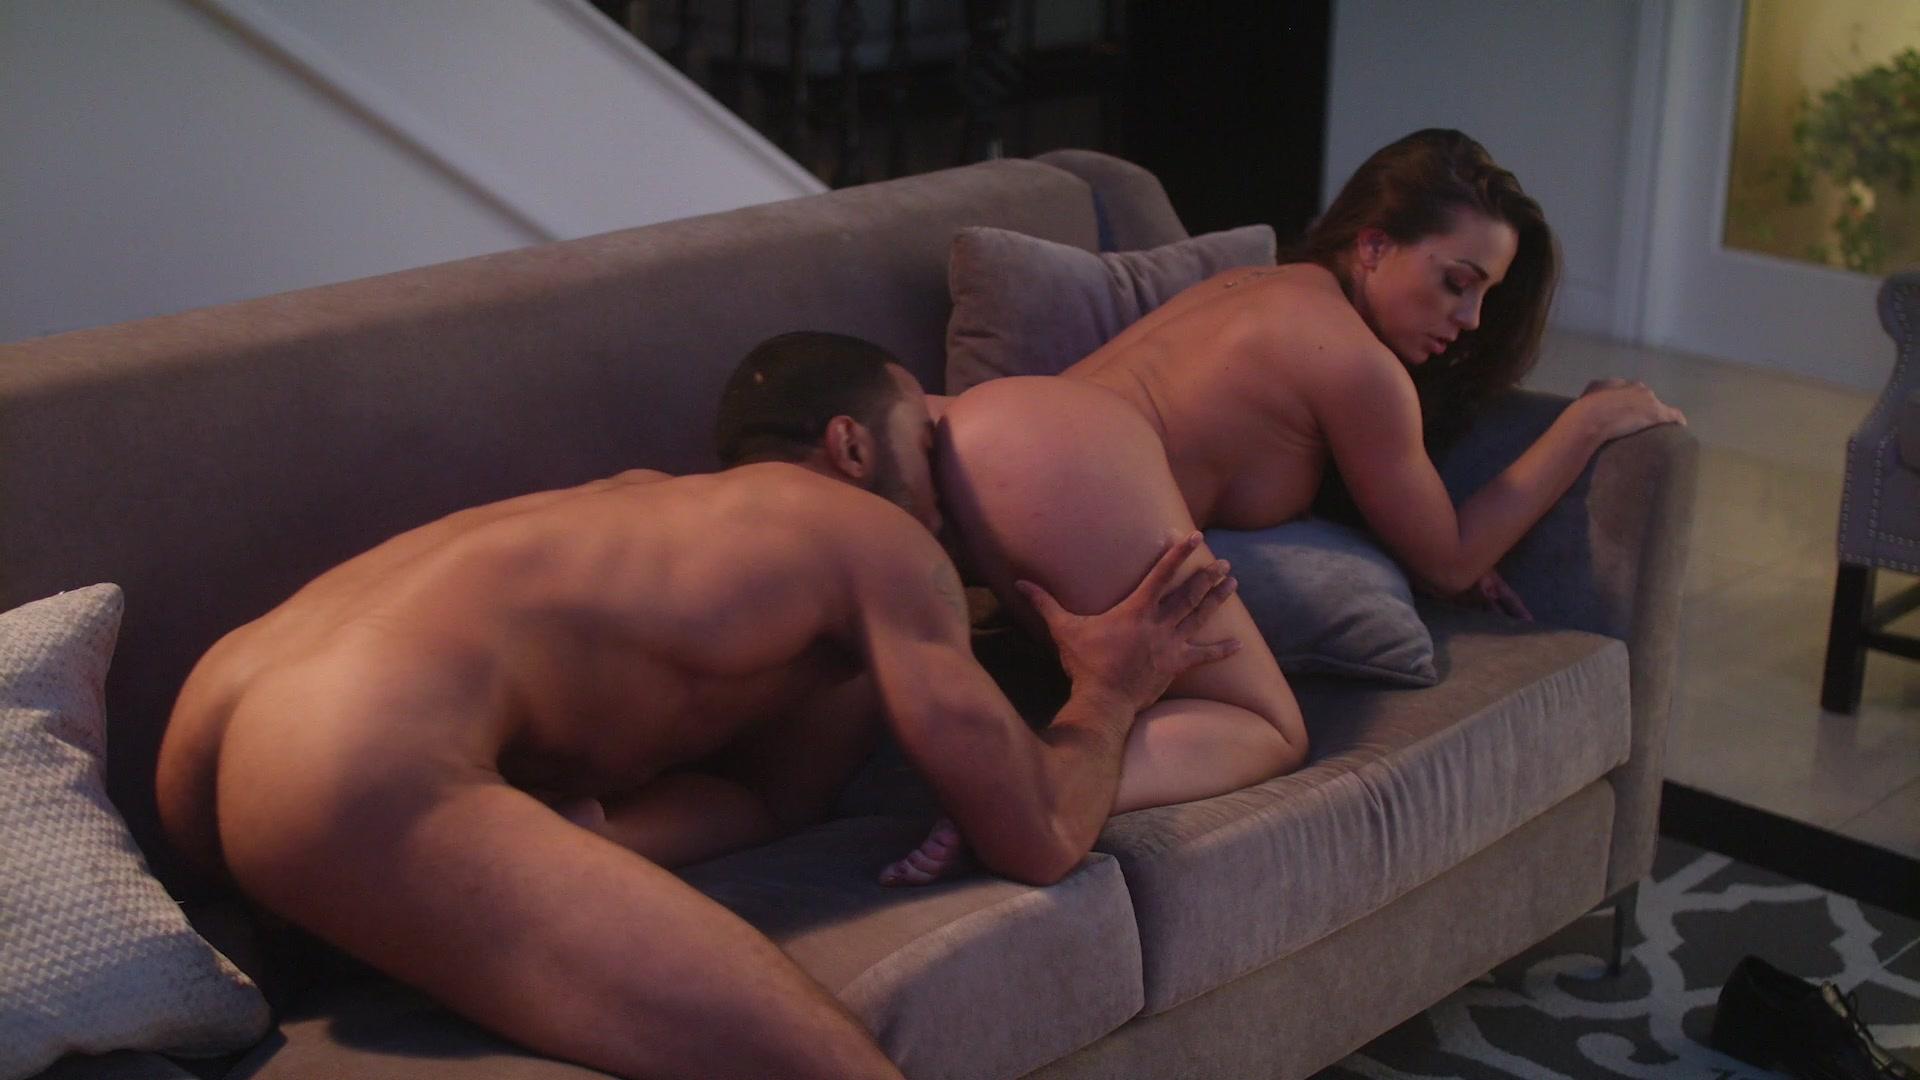 Adult streaming pornographic photo